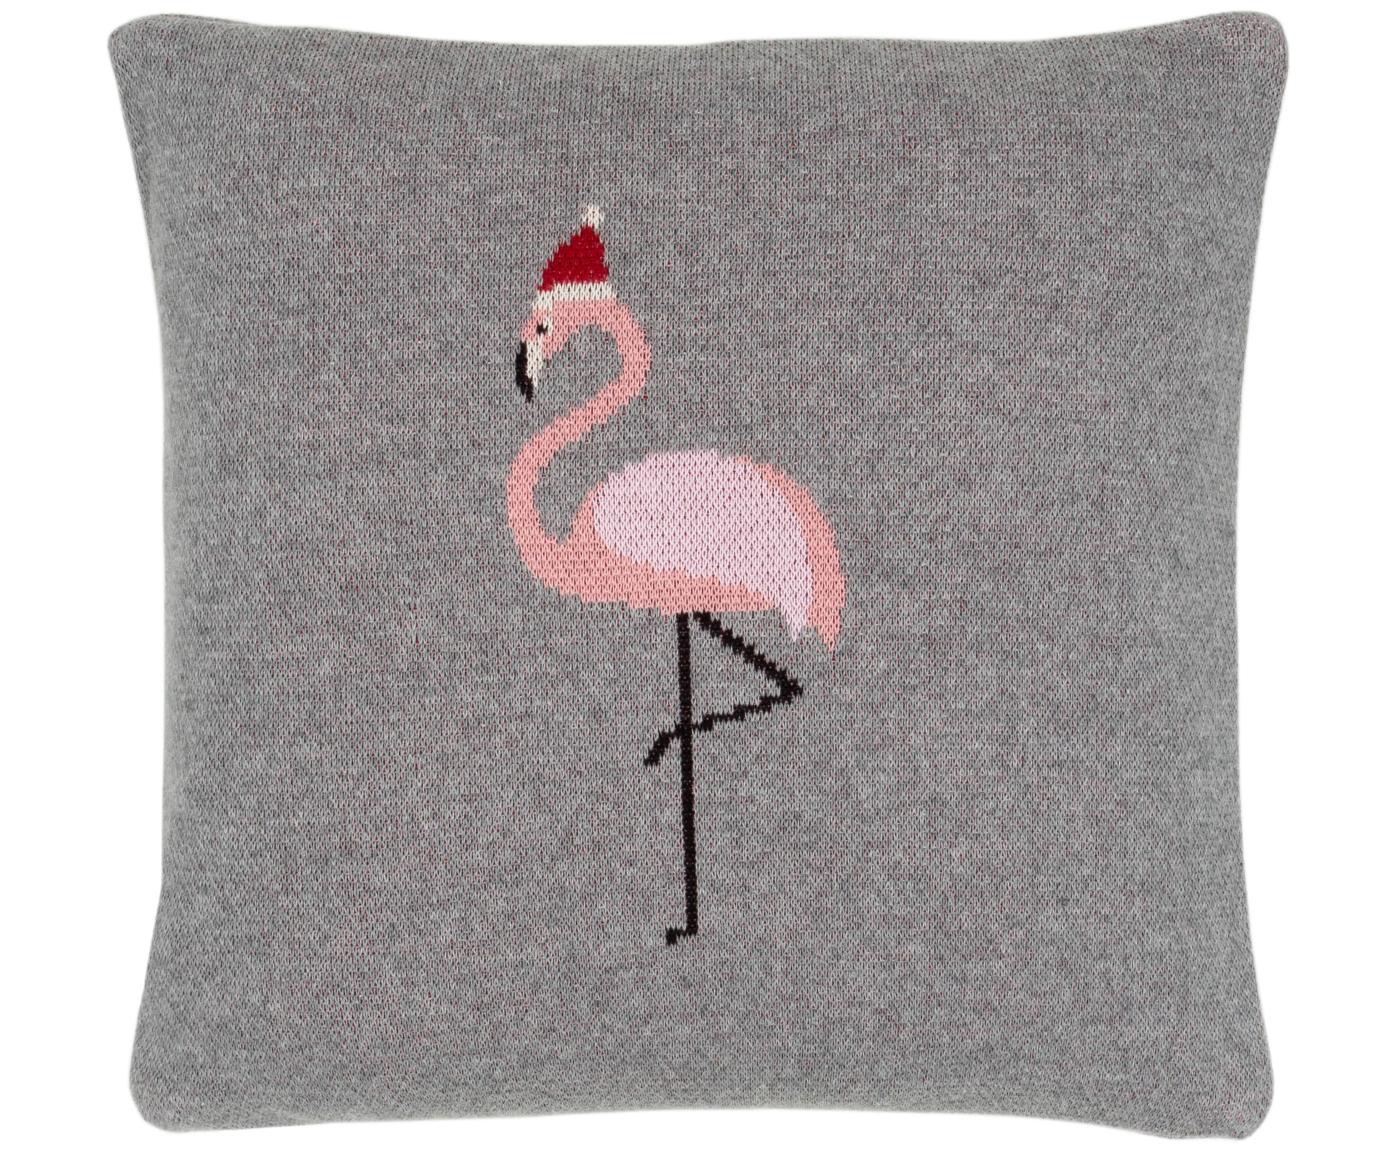 Gebreide kussenhoes Flamingo, 100% katoen, Grijs, multicolour, 40 x 40 cm